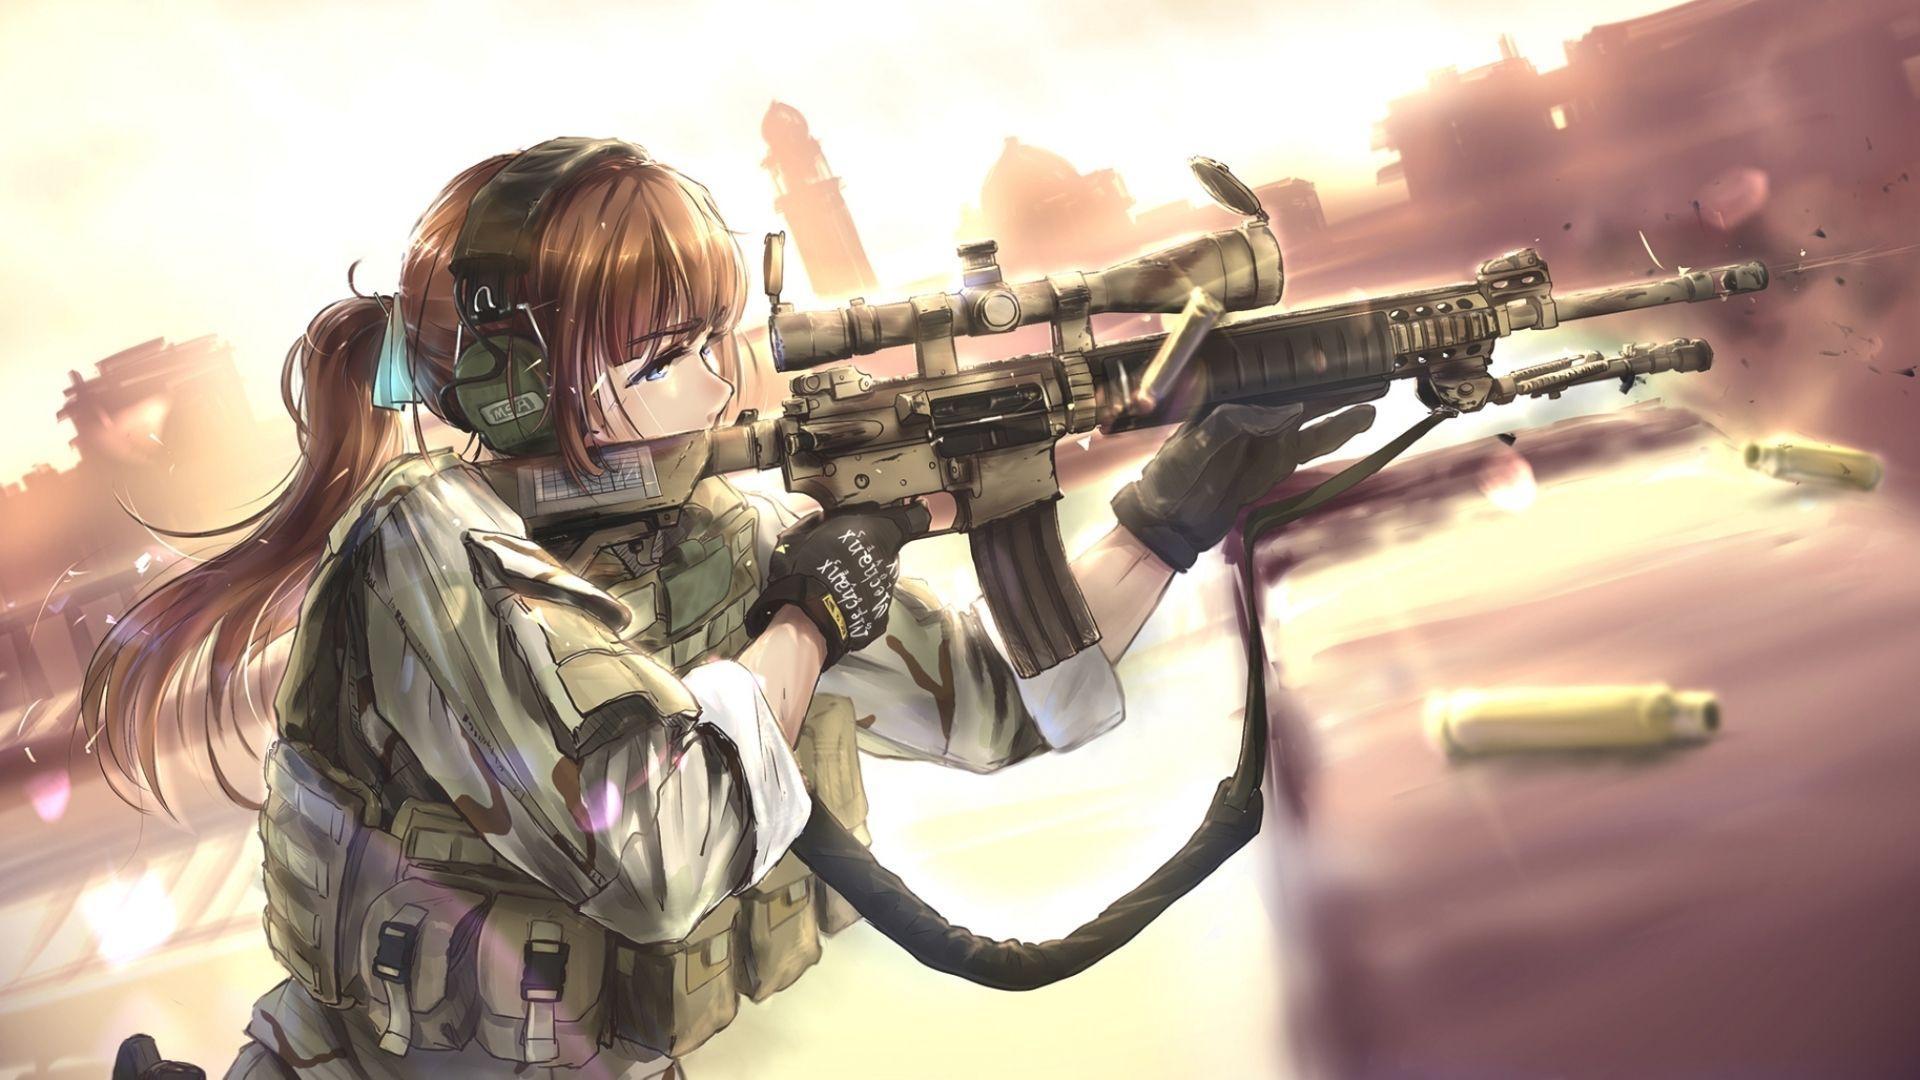 Anime Gun Wallpapers - Top Free Anime Gun Backgrounds